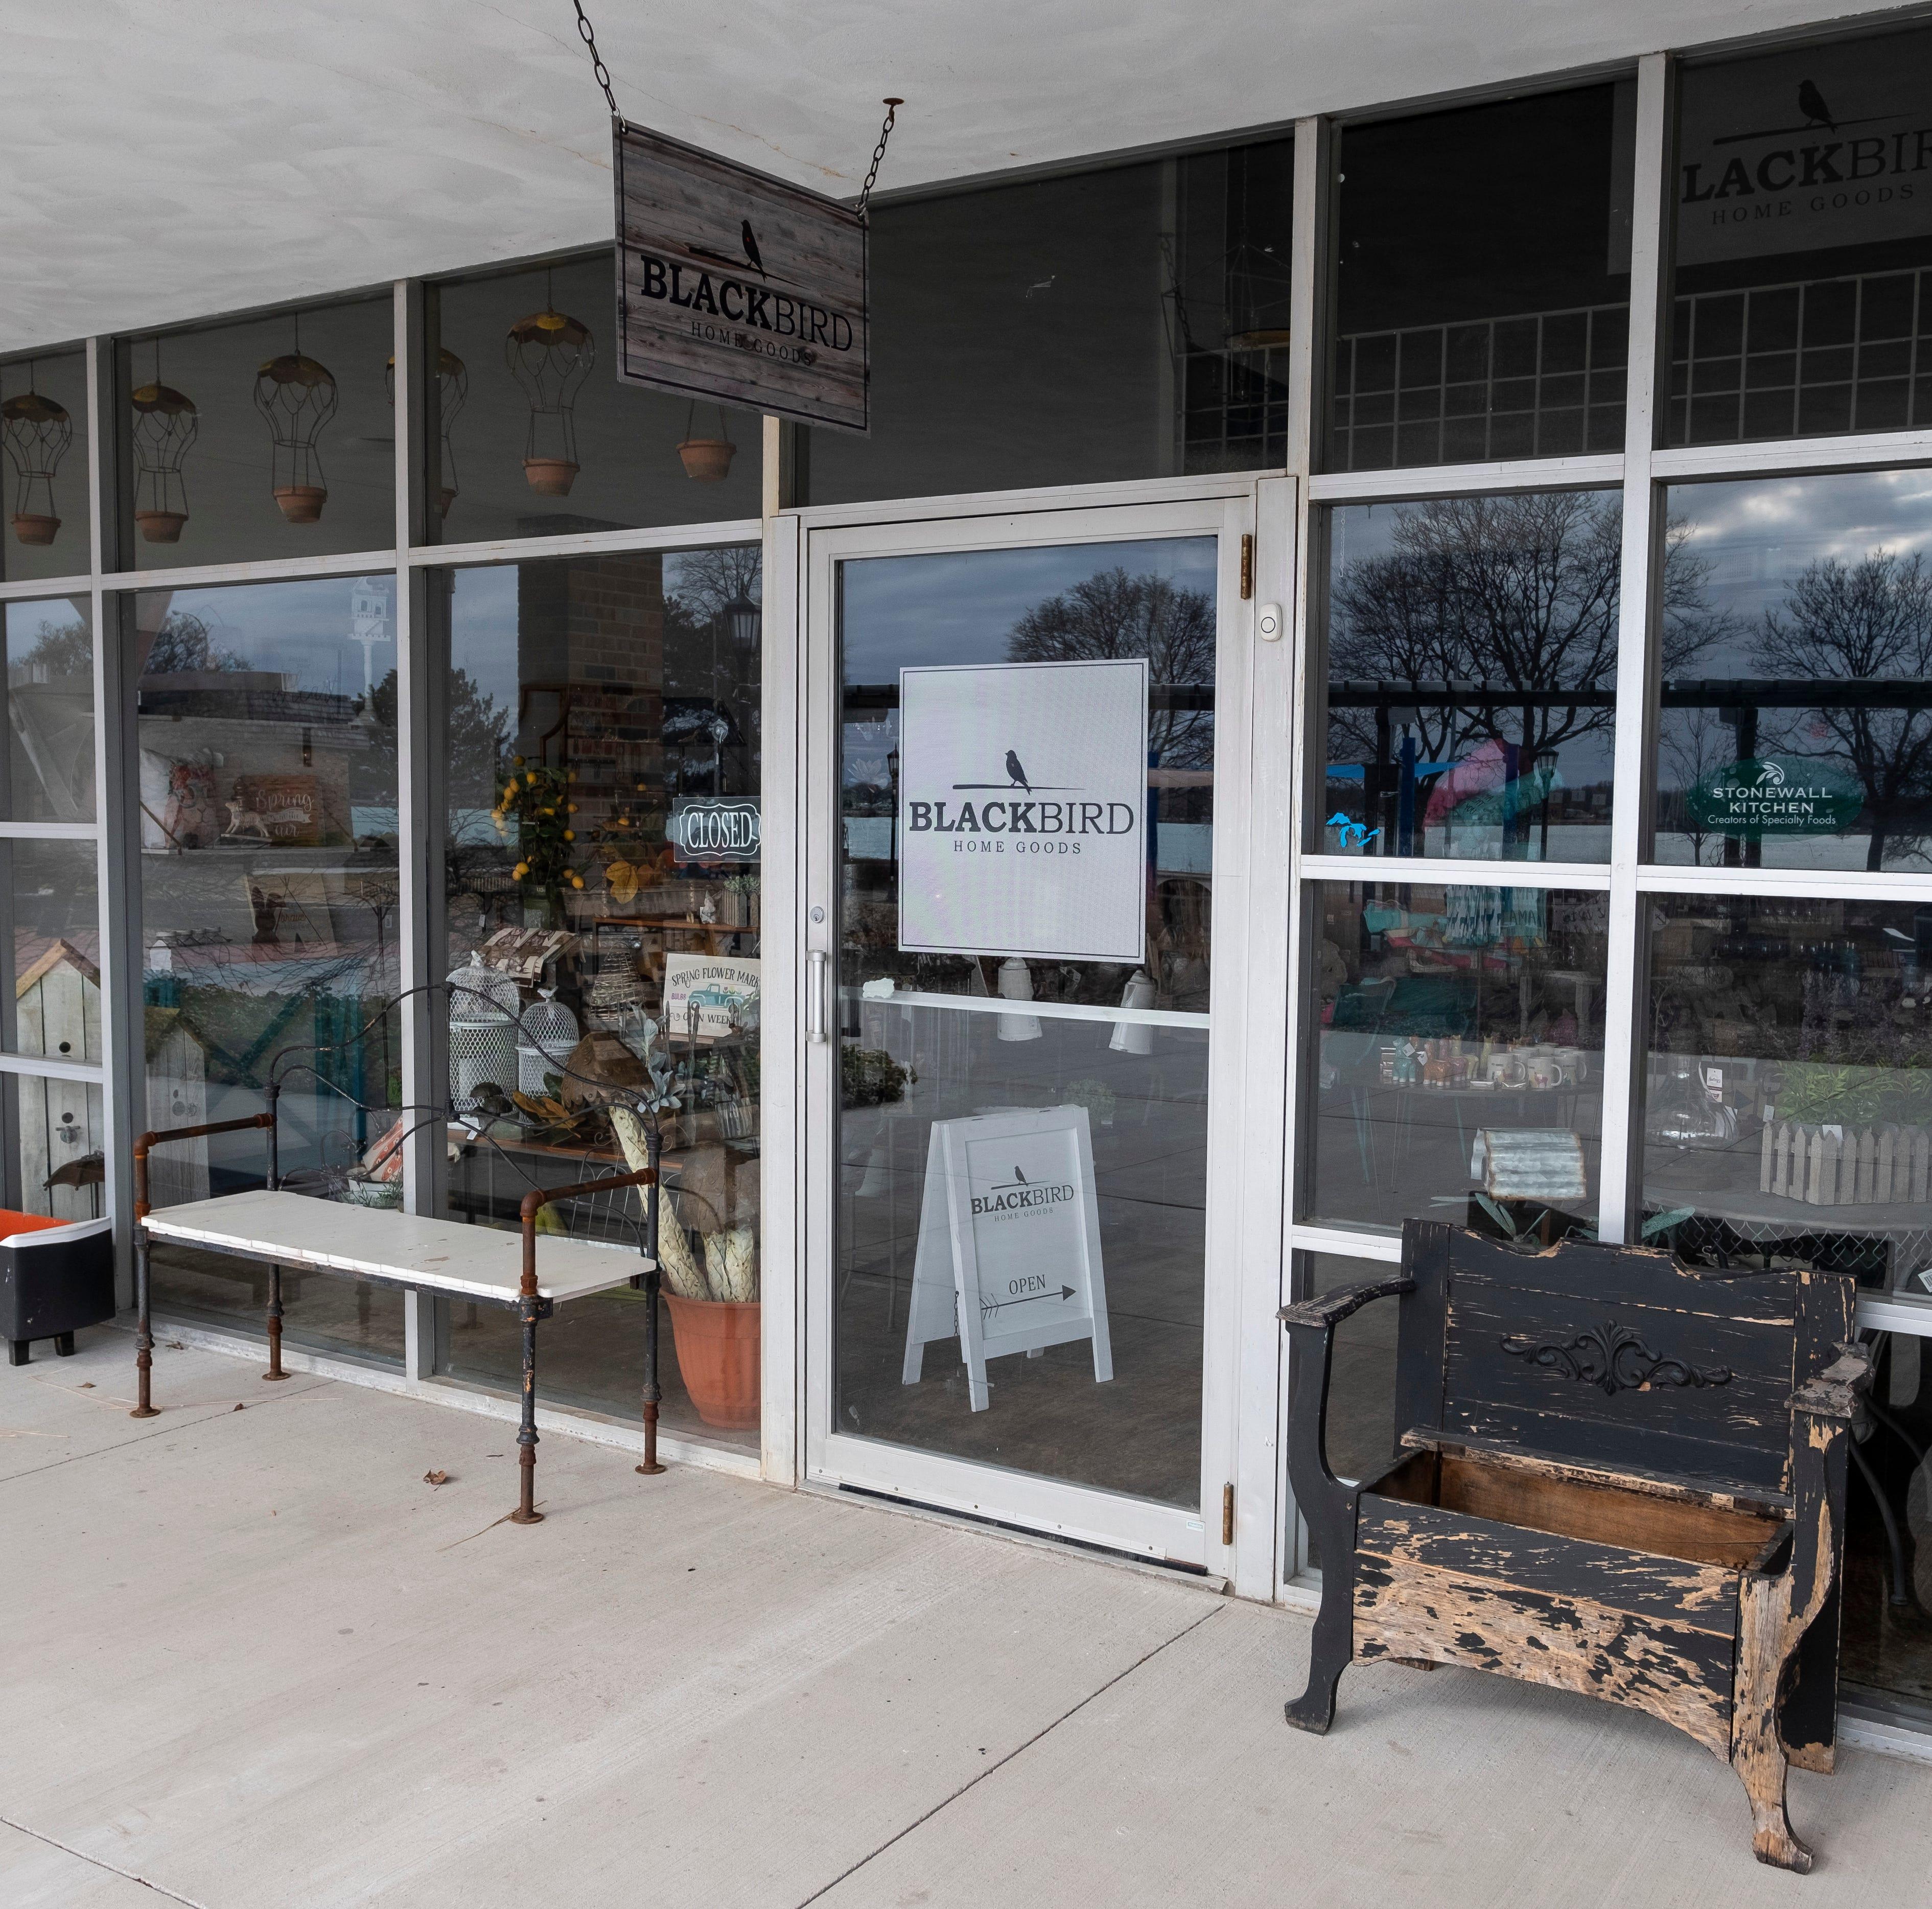 Blackbird Home Goods expands into new St. Clair plaza spot